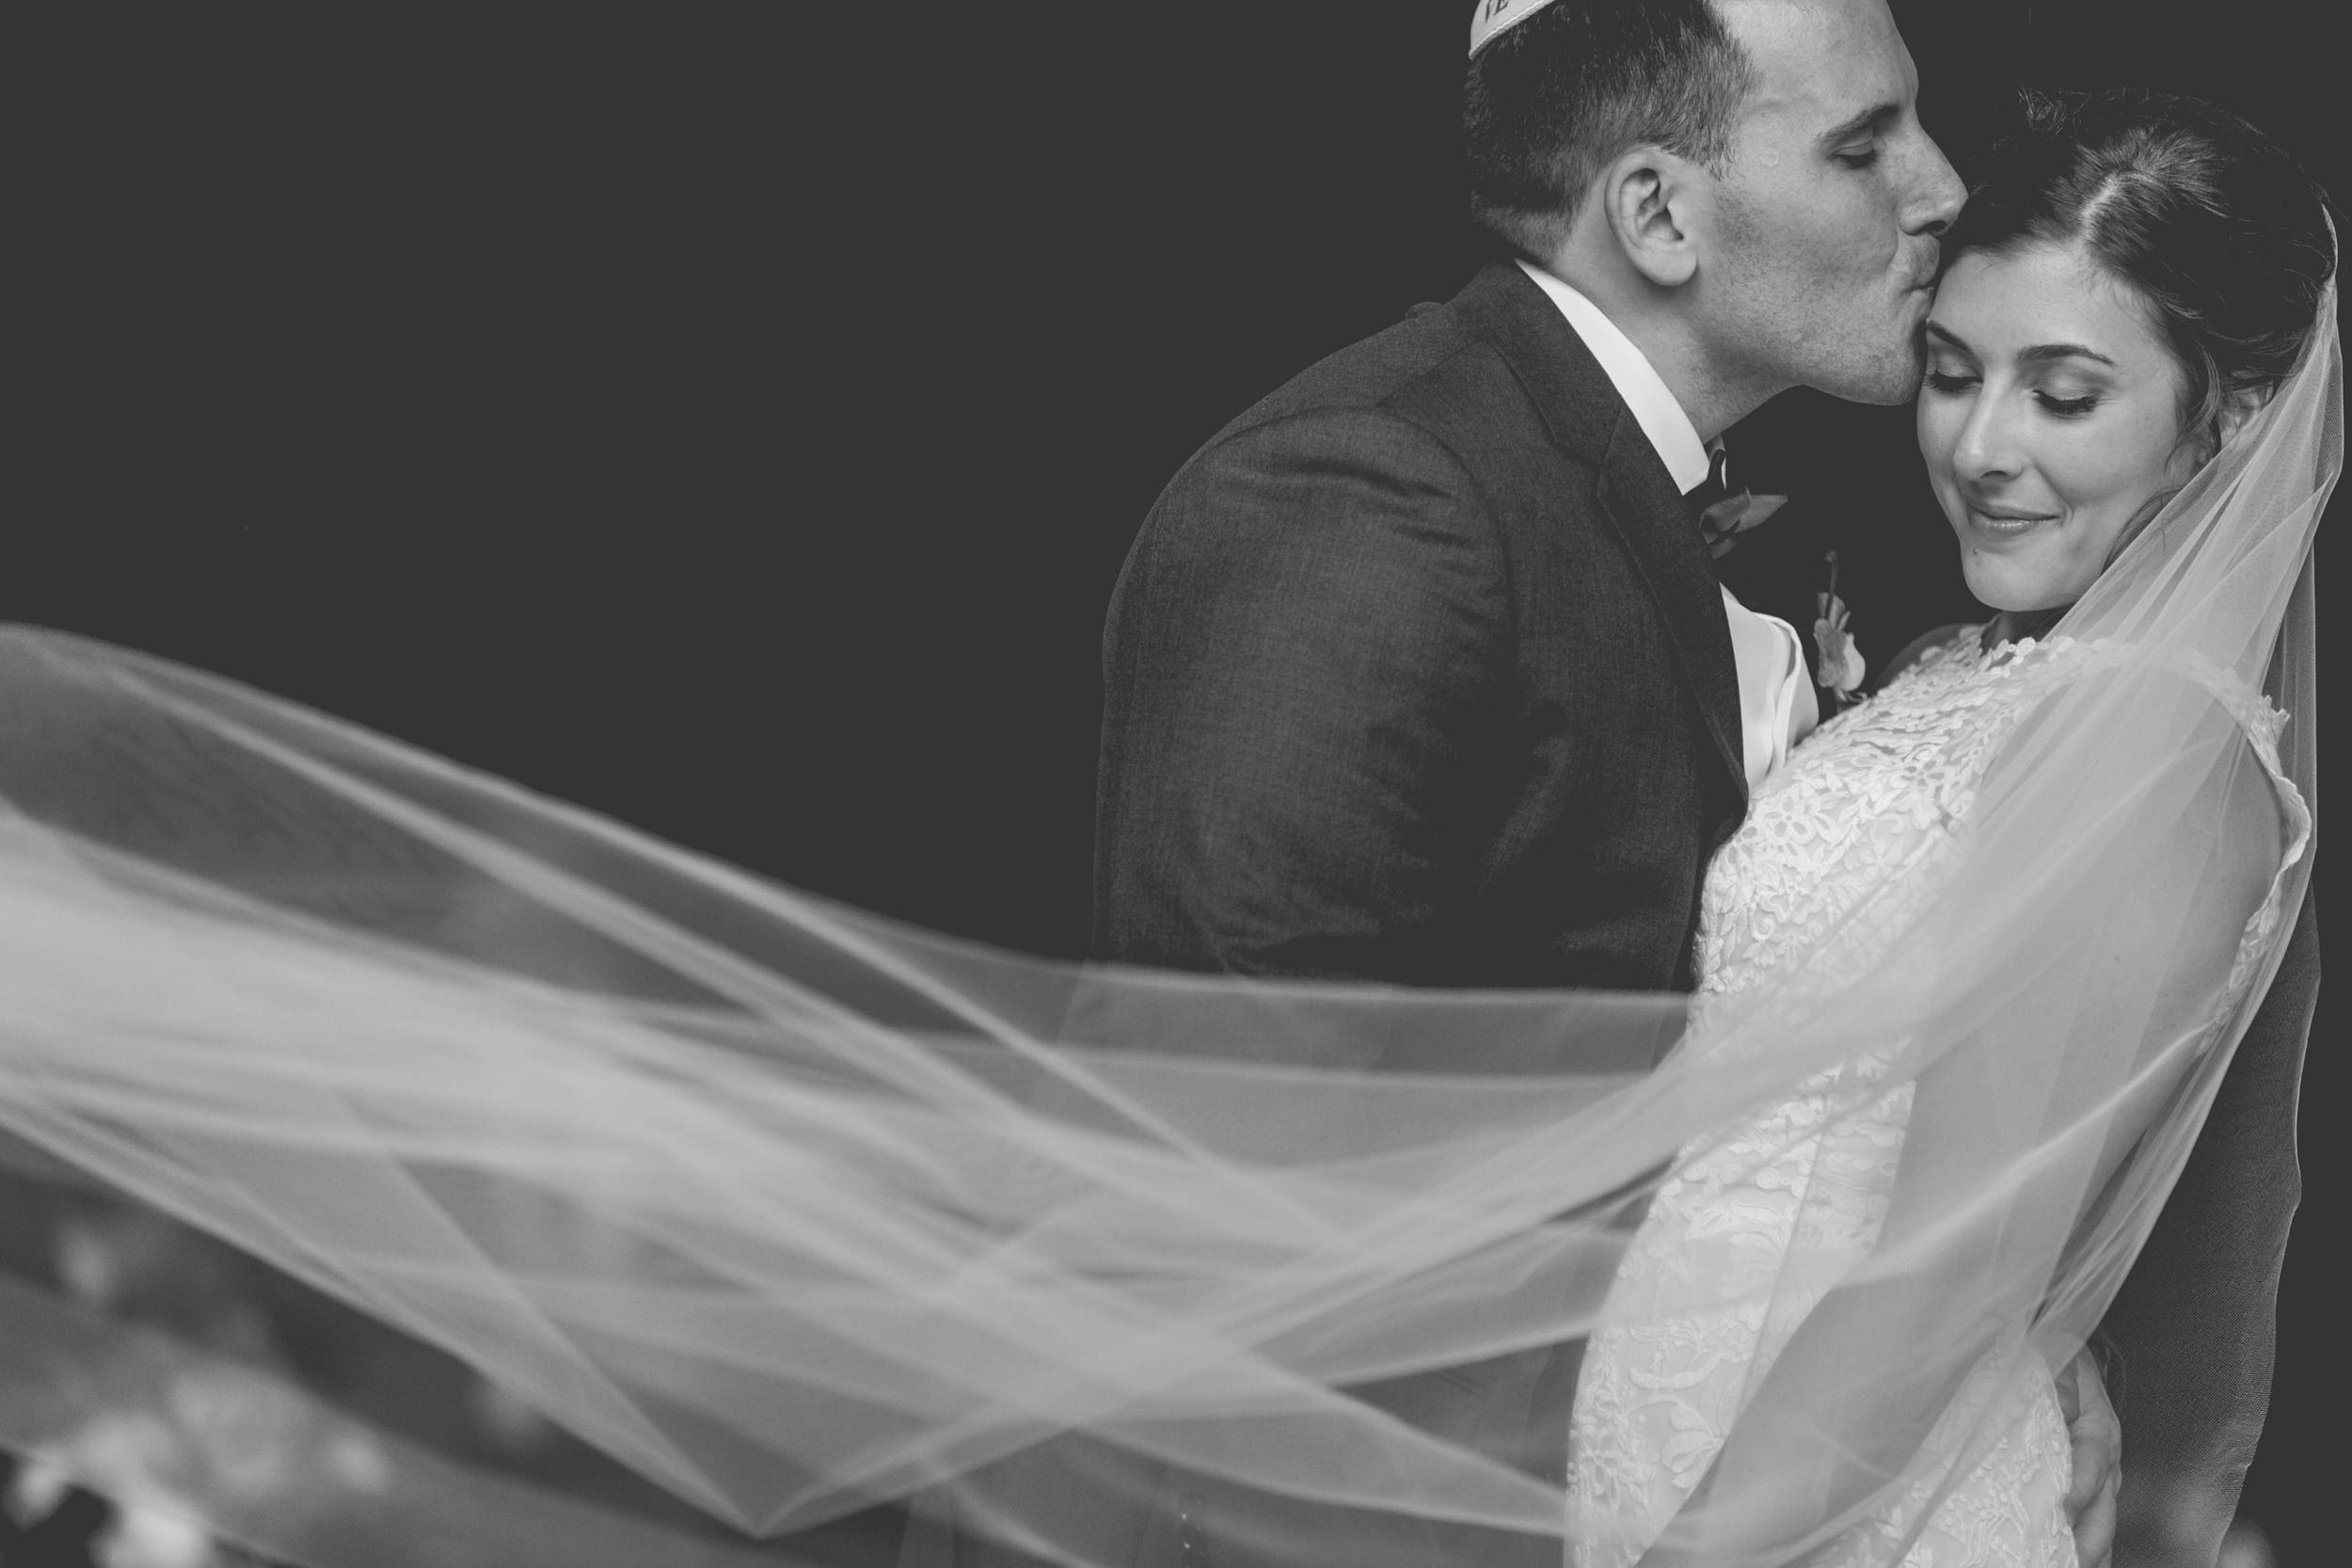 wedding-photography-dark-moody-rustic-details-13.jpg